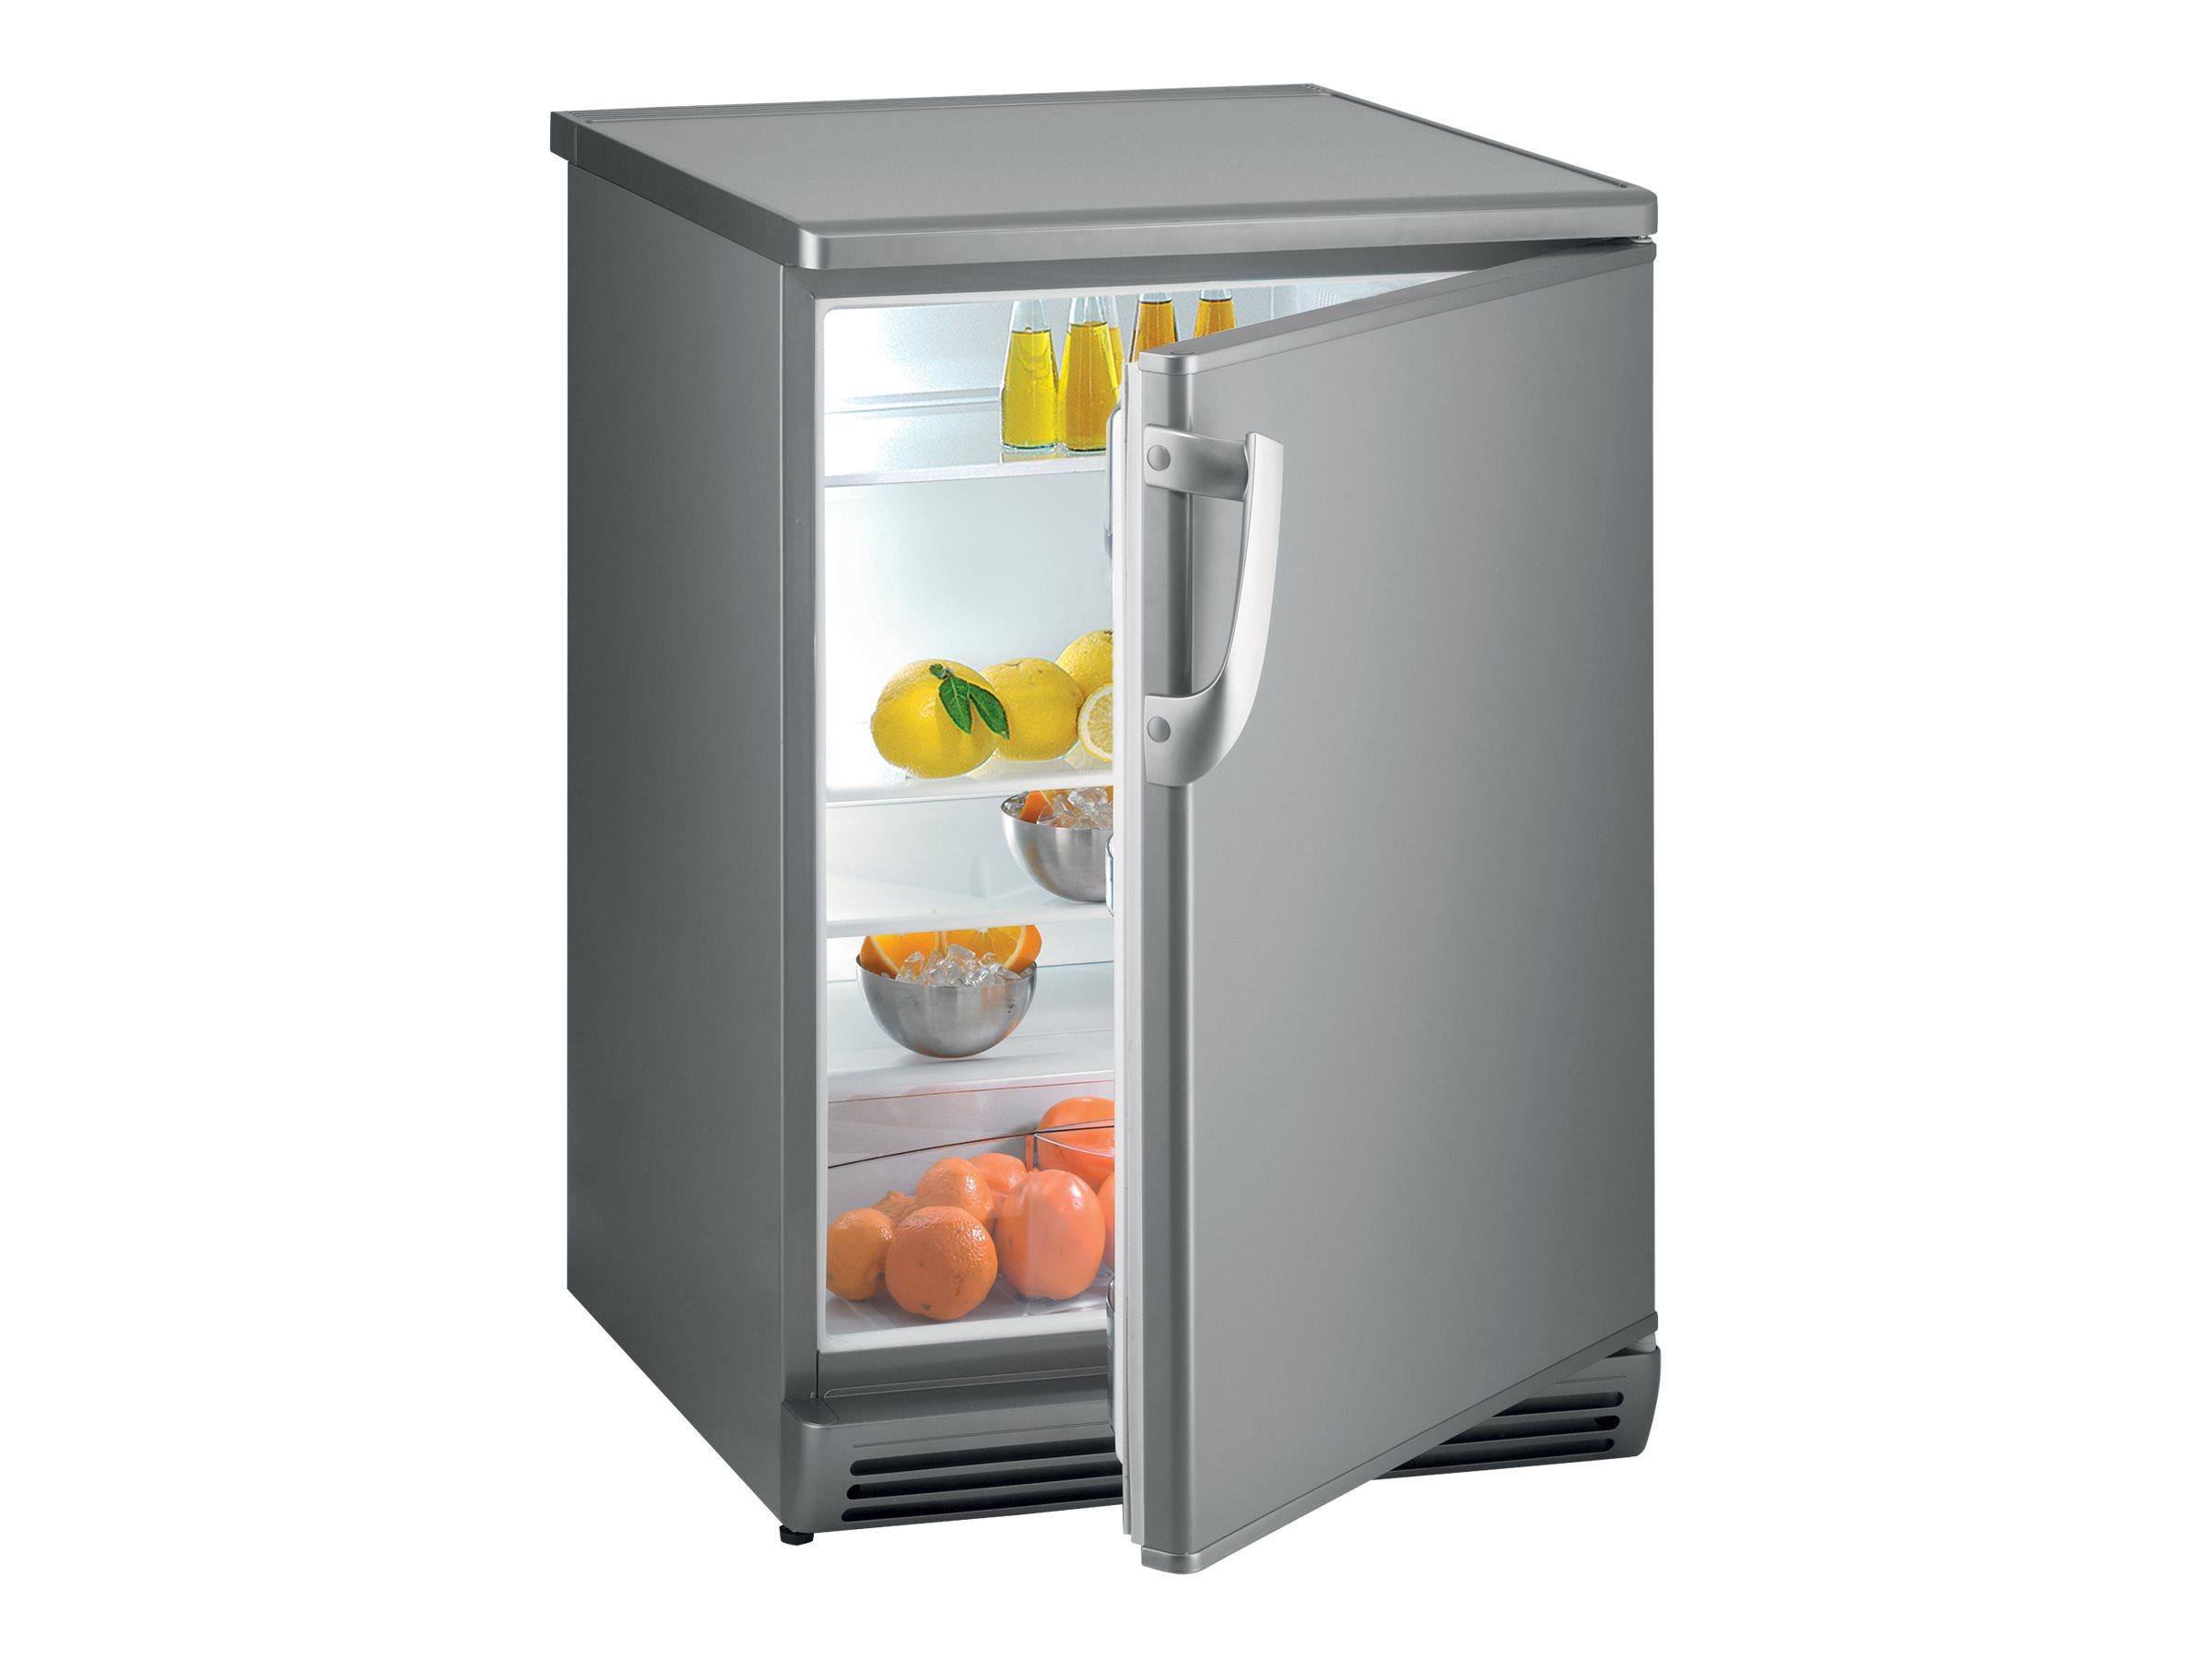 Aeg Kühlschrank Integrierbar 122 Cm : Kühlschrank cm hoch siemens ki lad iq coolefficiency a